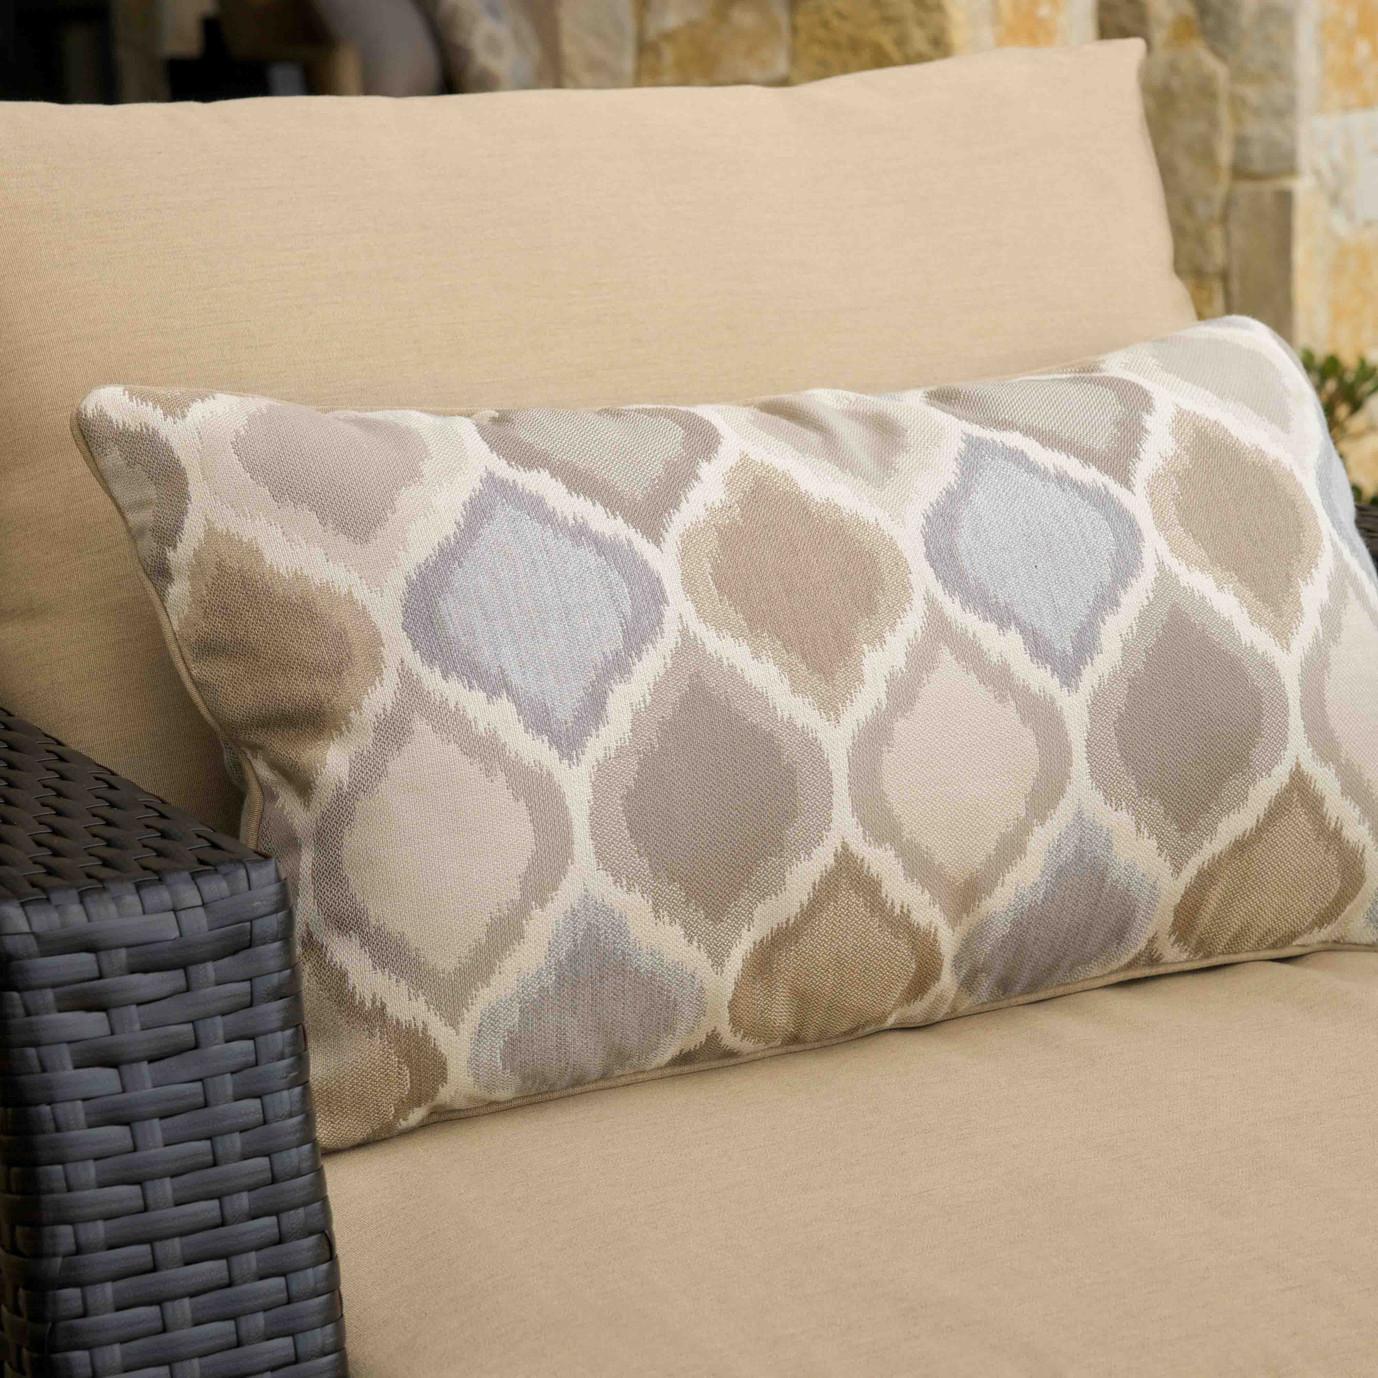 Portofino® Comfort 5pc Club Chair Set - Heather Beige